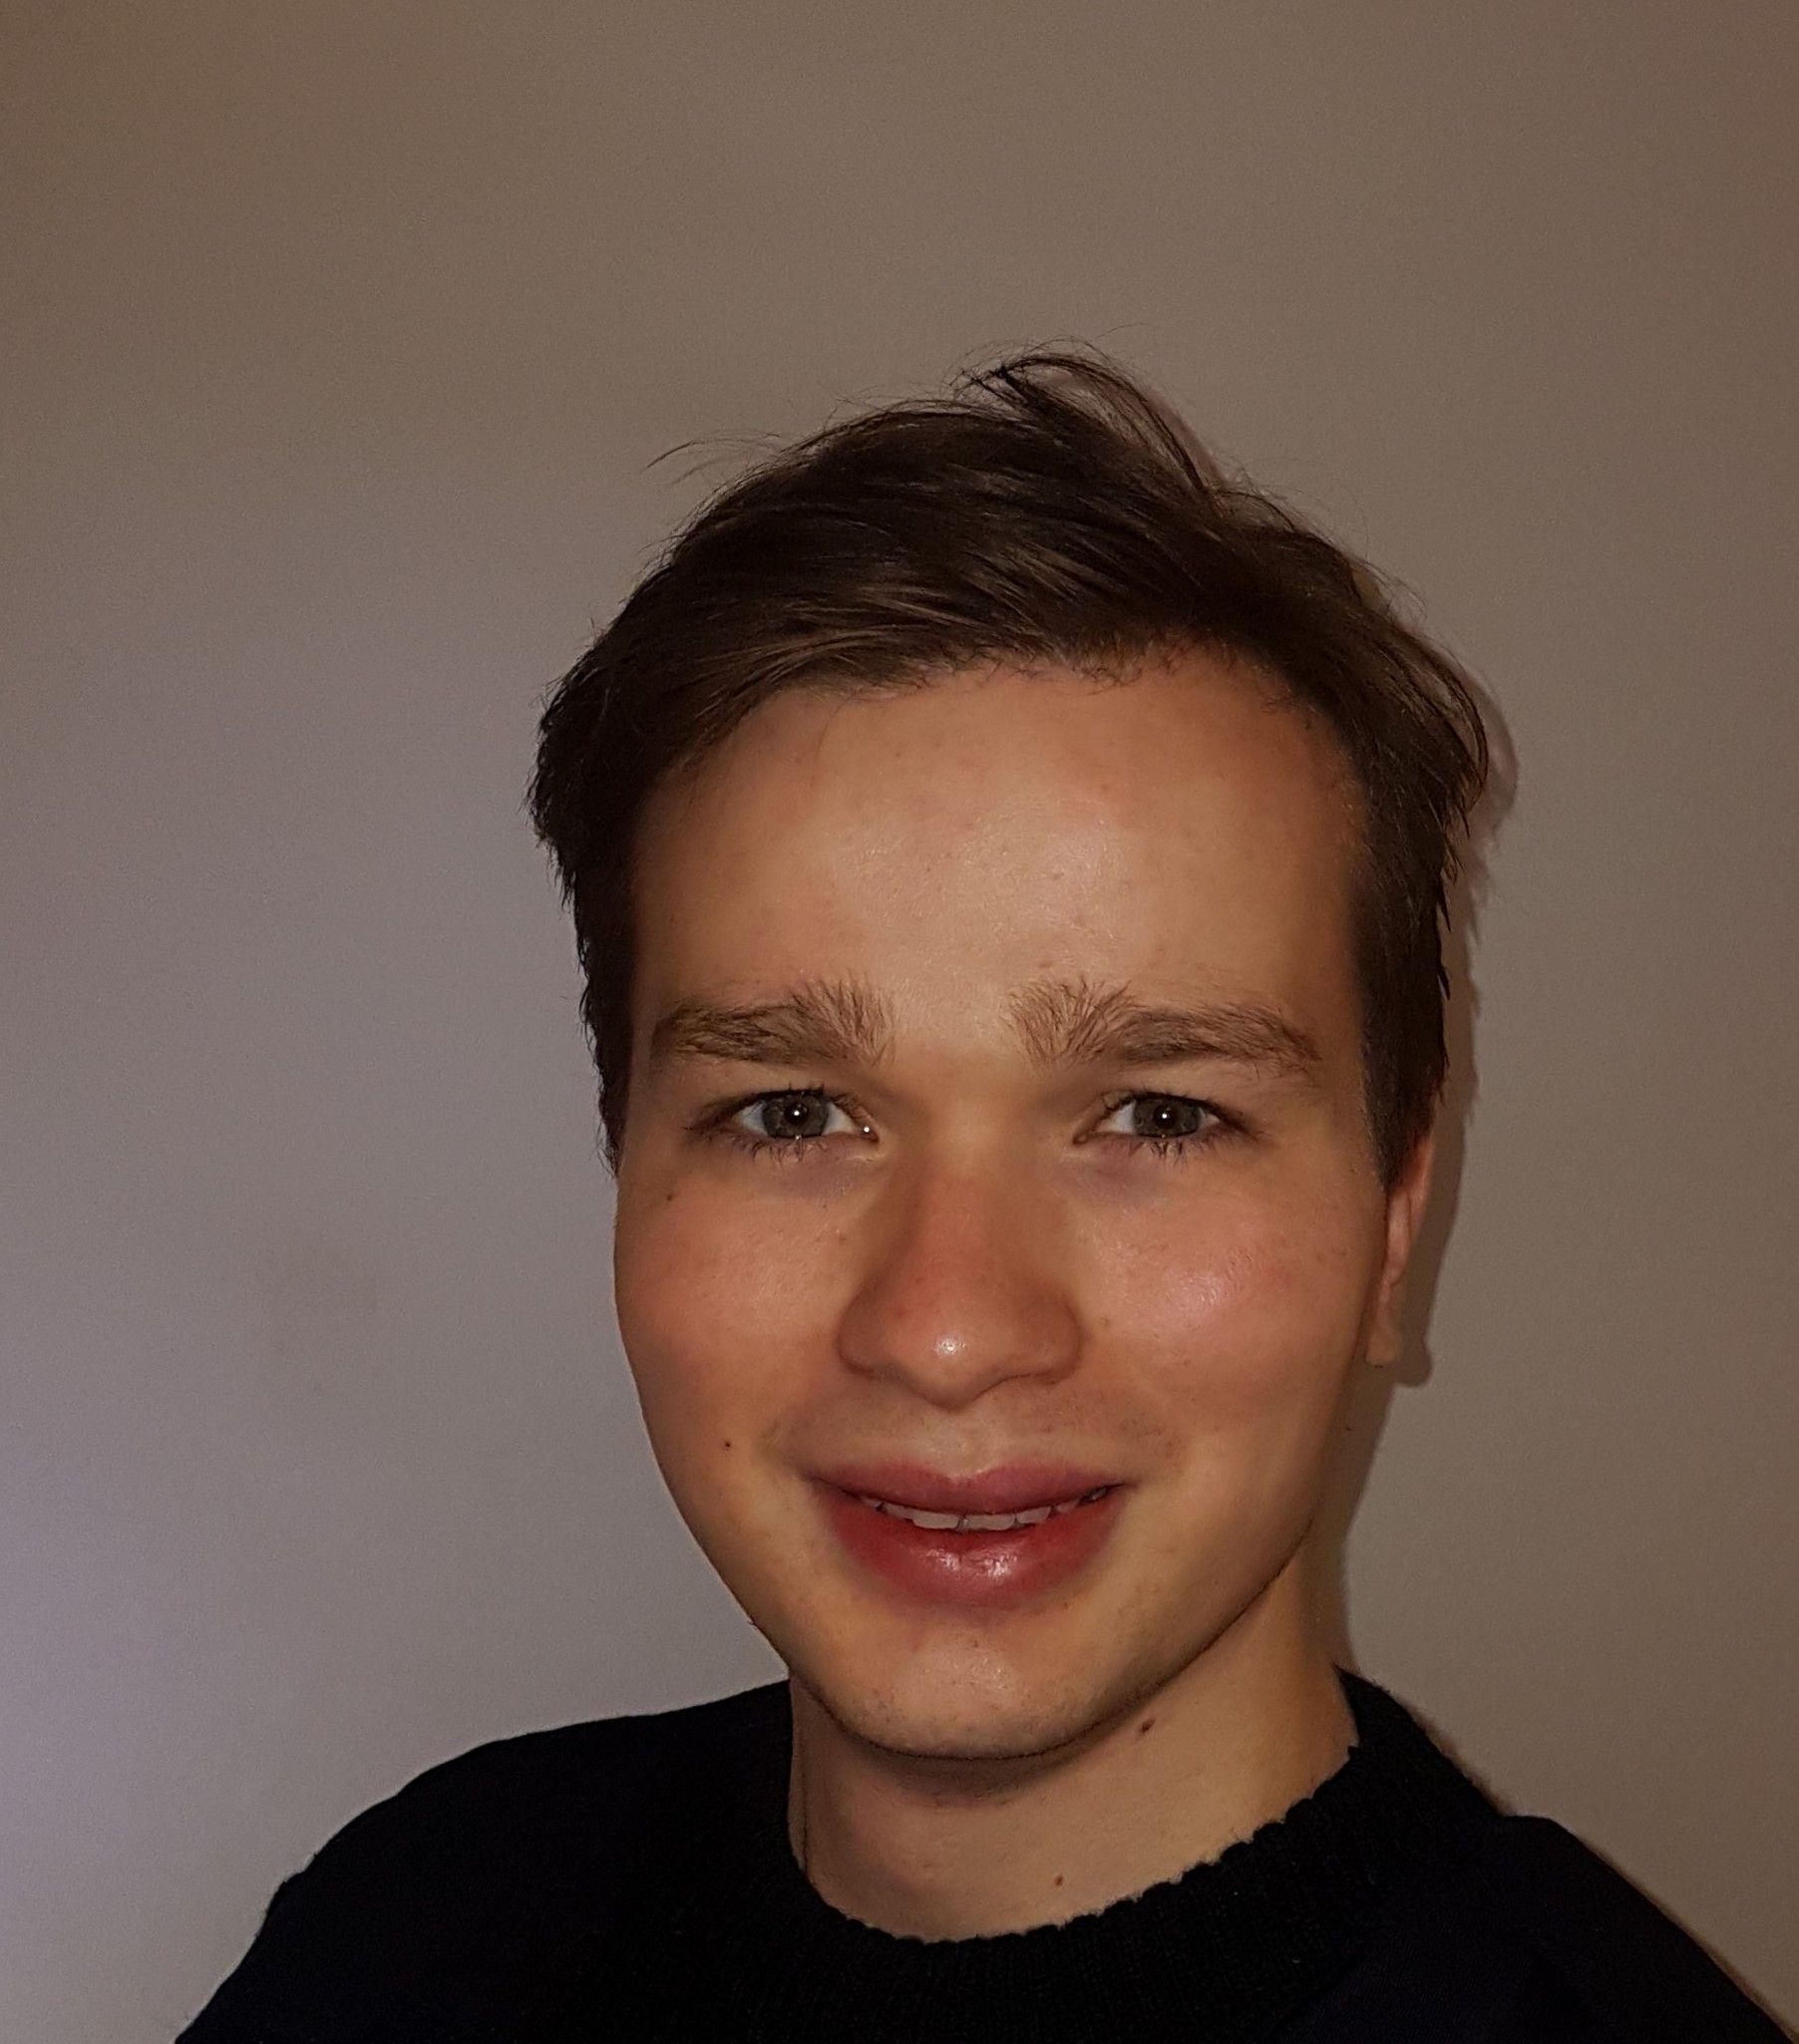 Sander Eide Knudsen